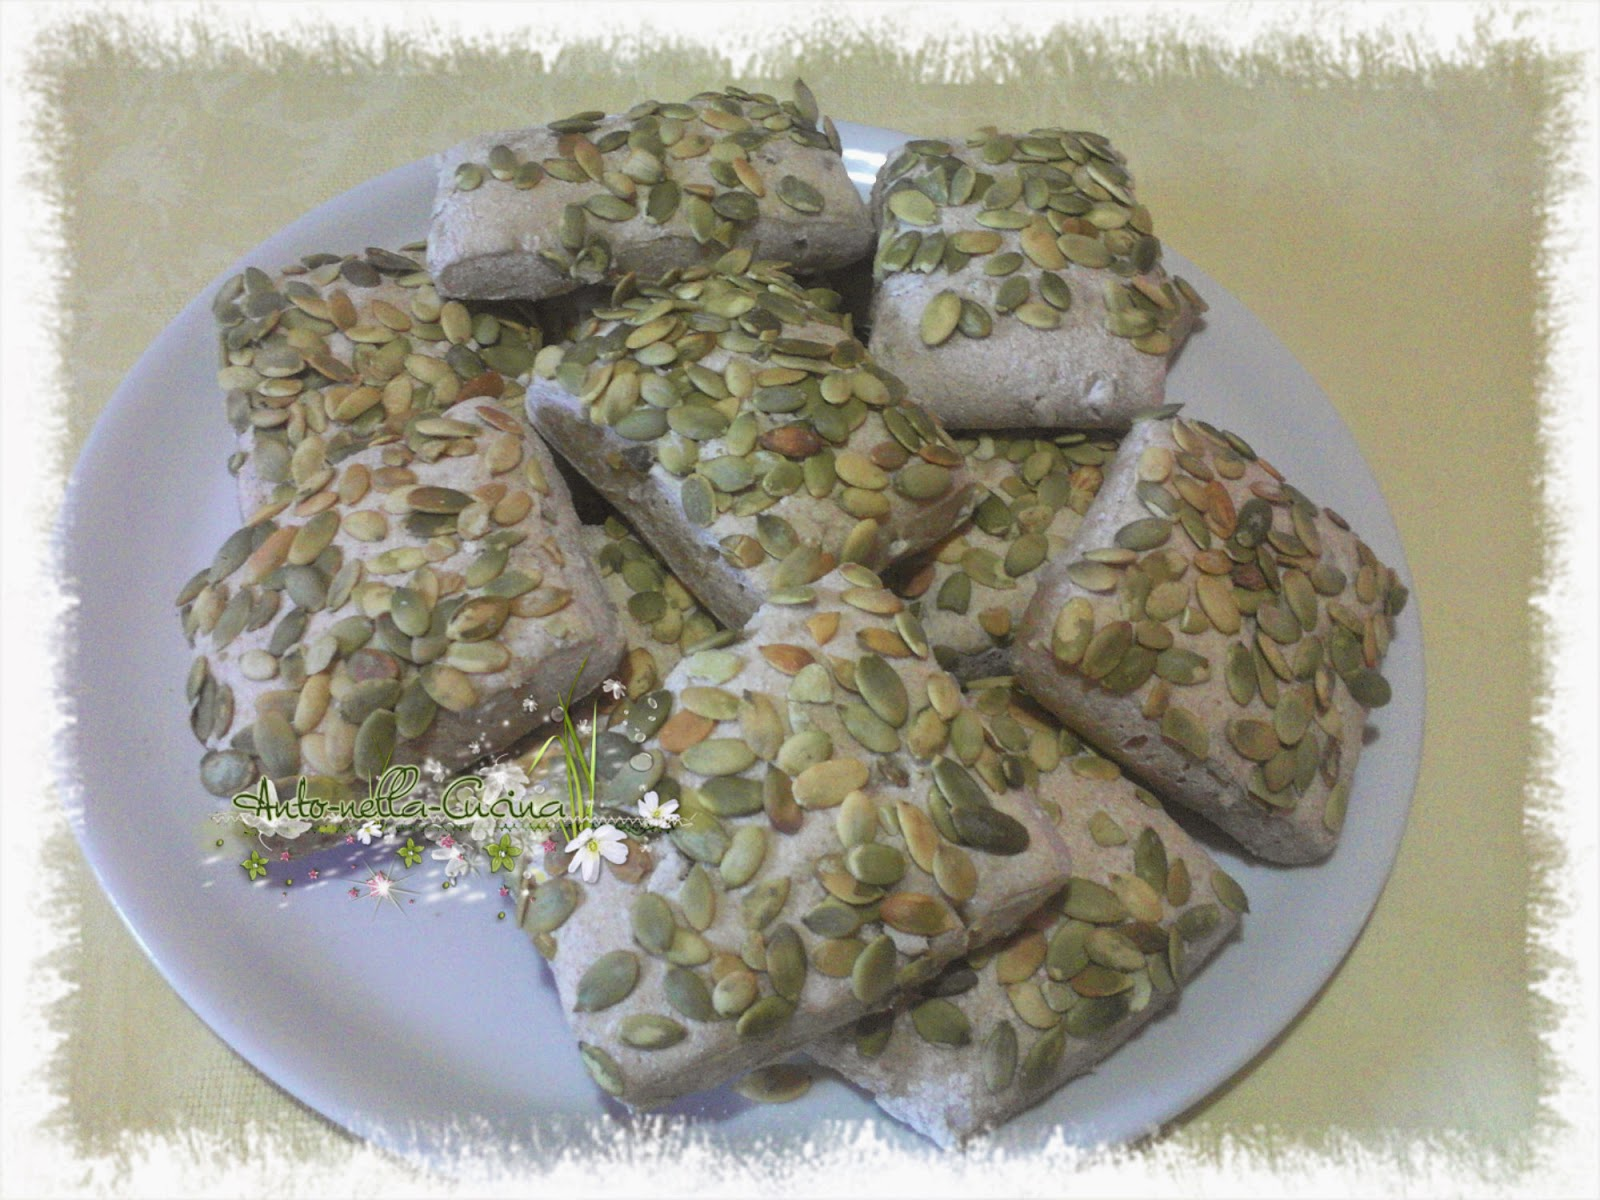 panini semi integrali ai semi di zucca e girasole!